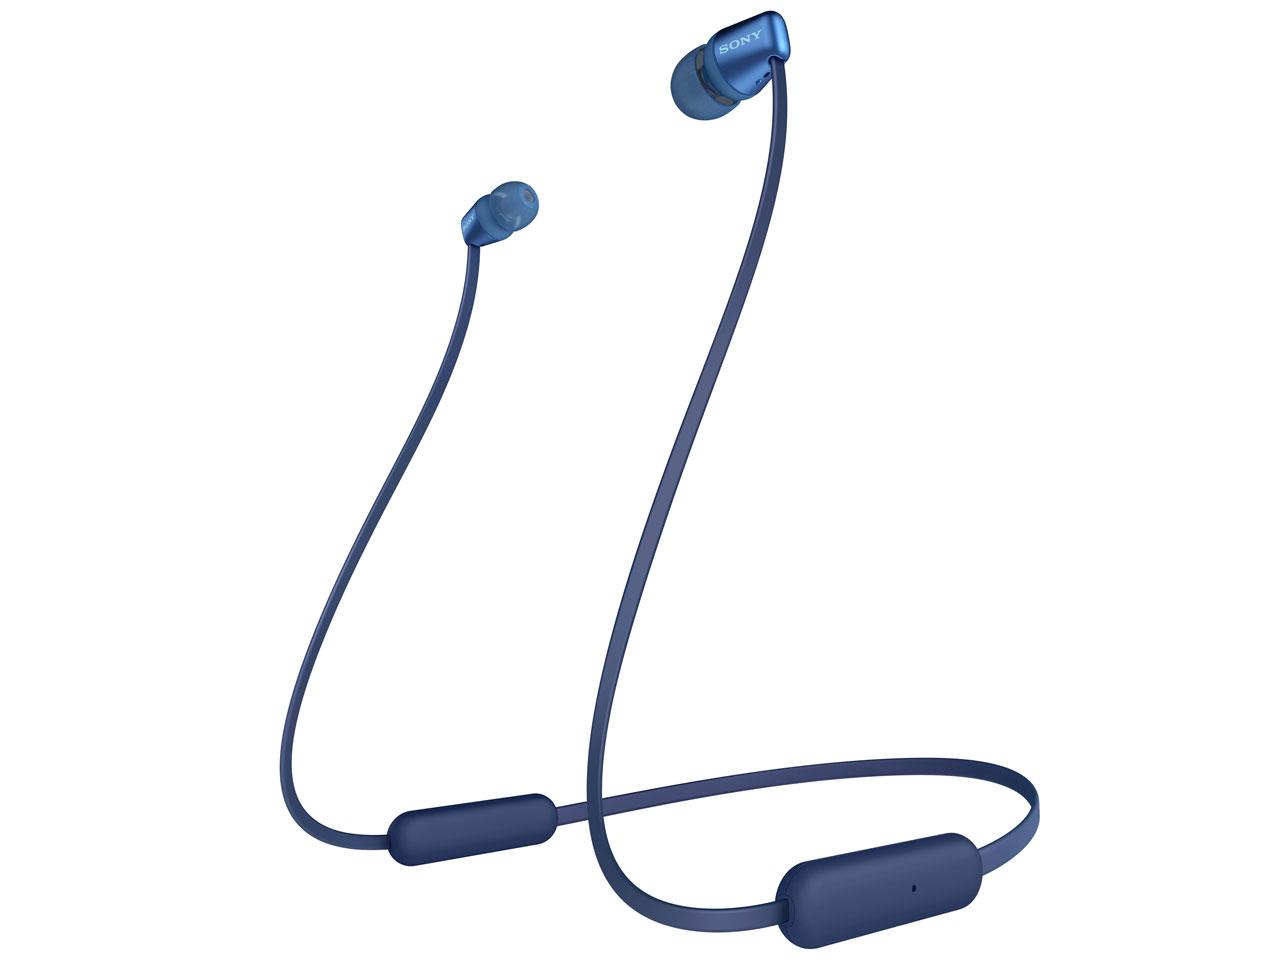 WI-C310 (L) [ブルー] の製品画像